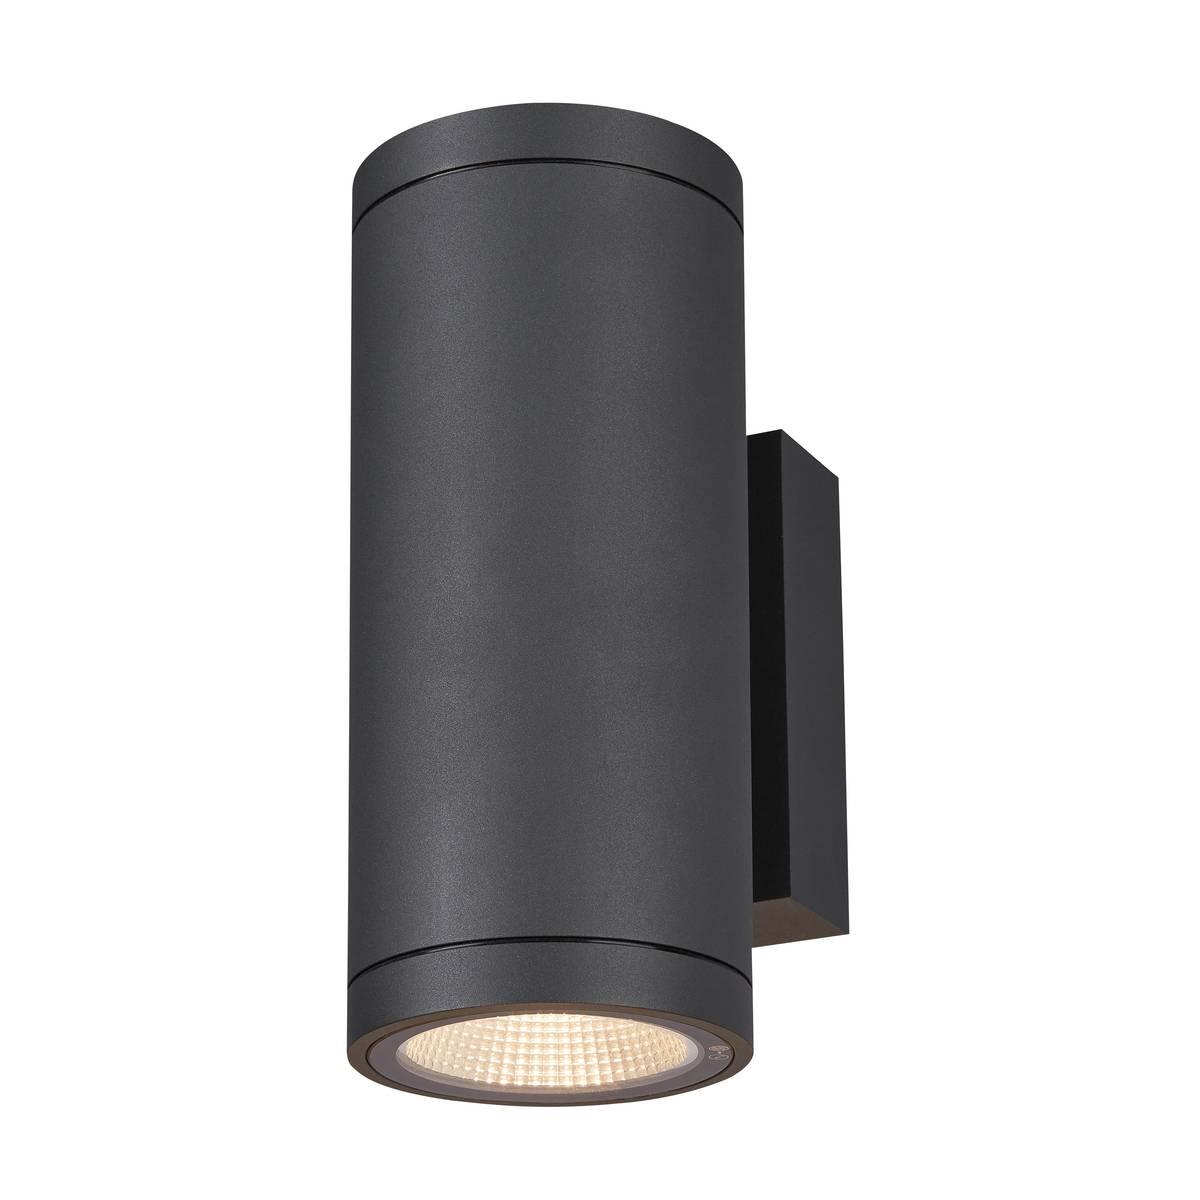 SLV buiten wandlamp Enola Round Up/Down M - antraciet